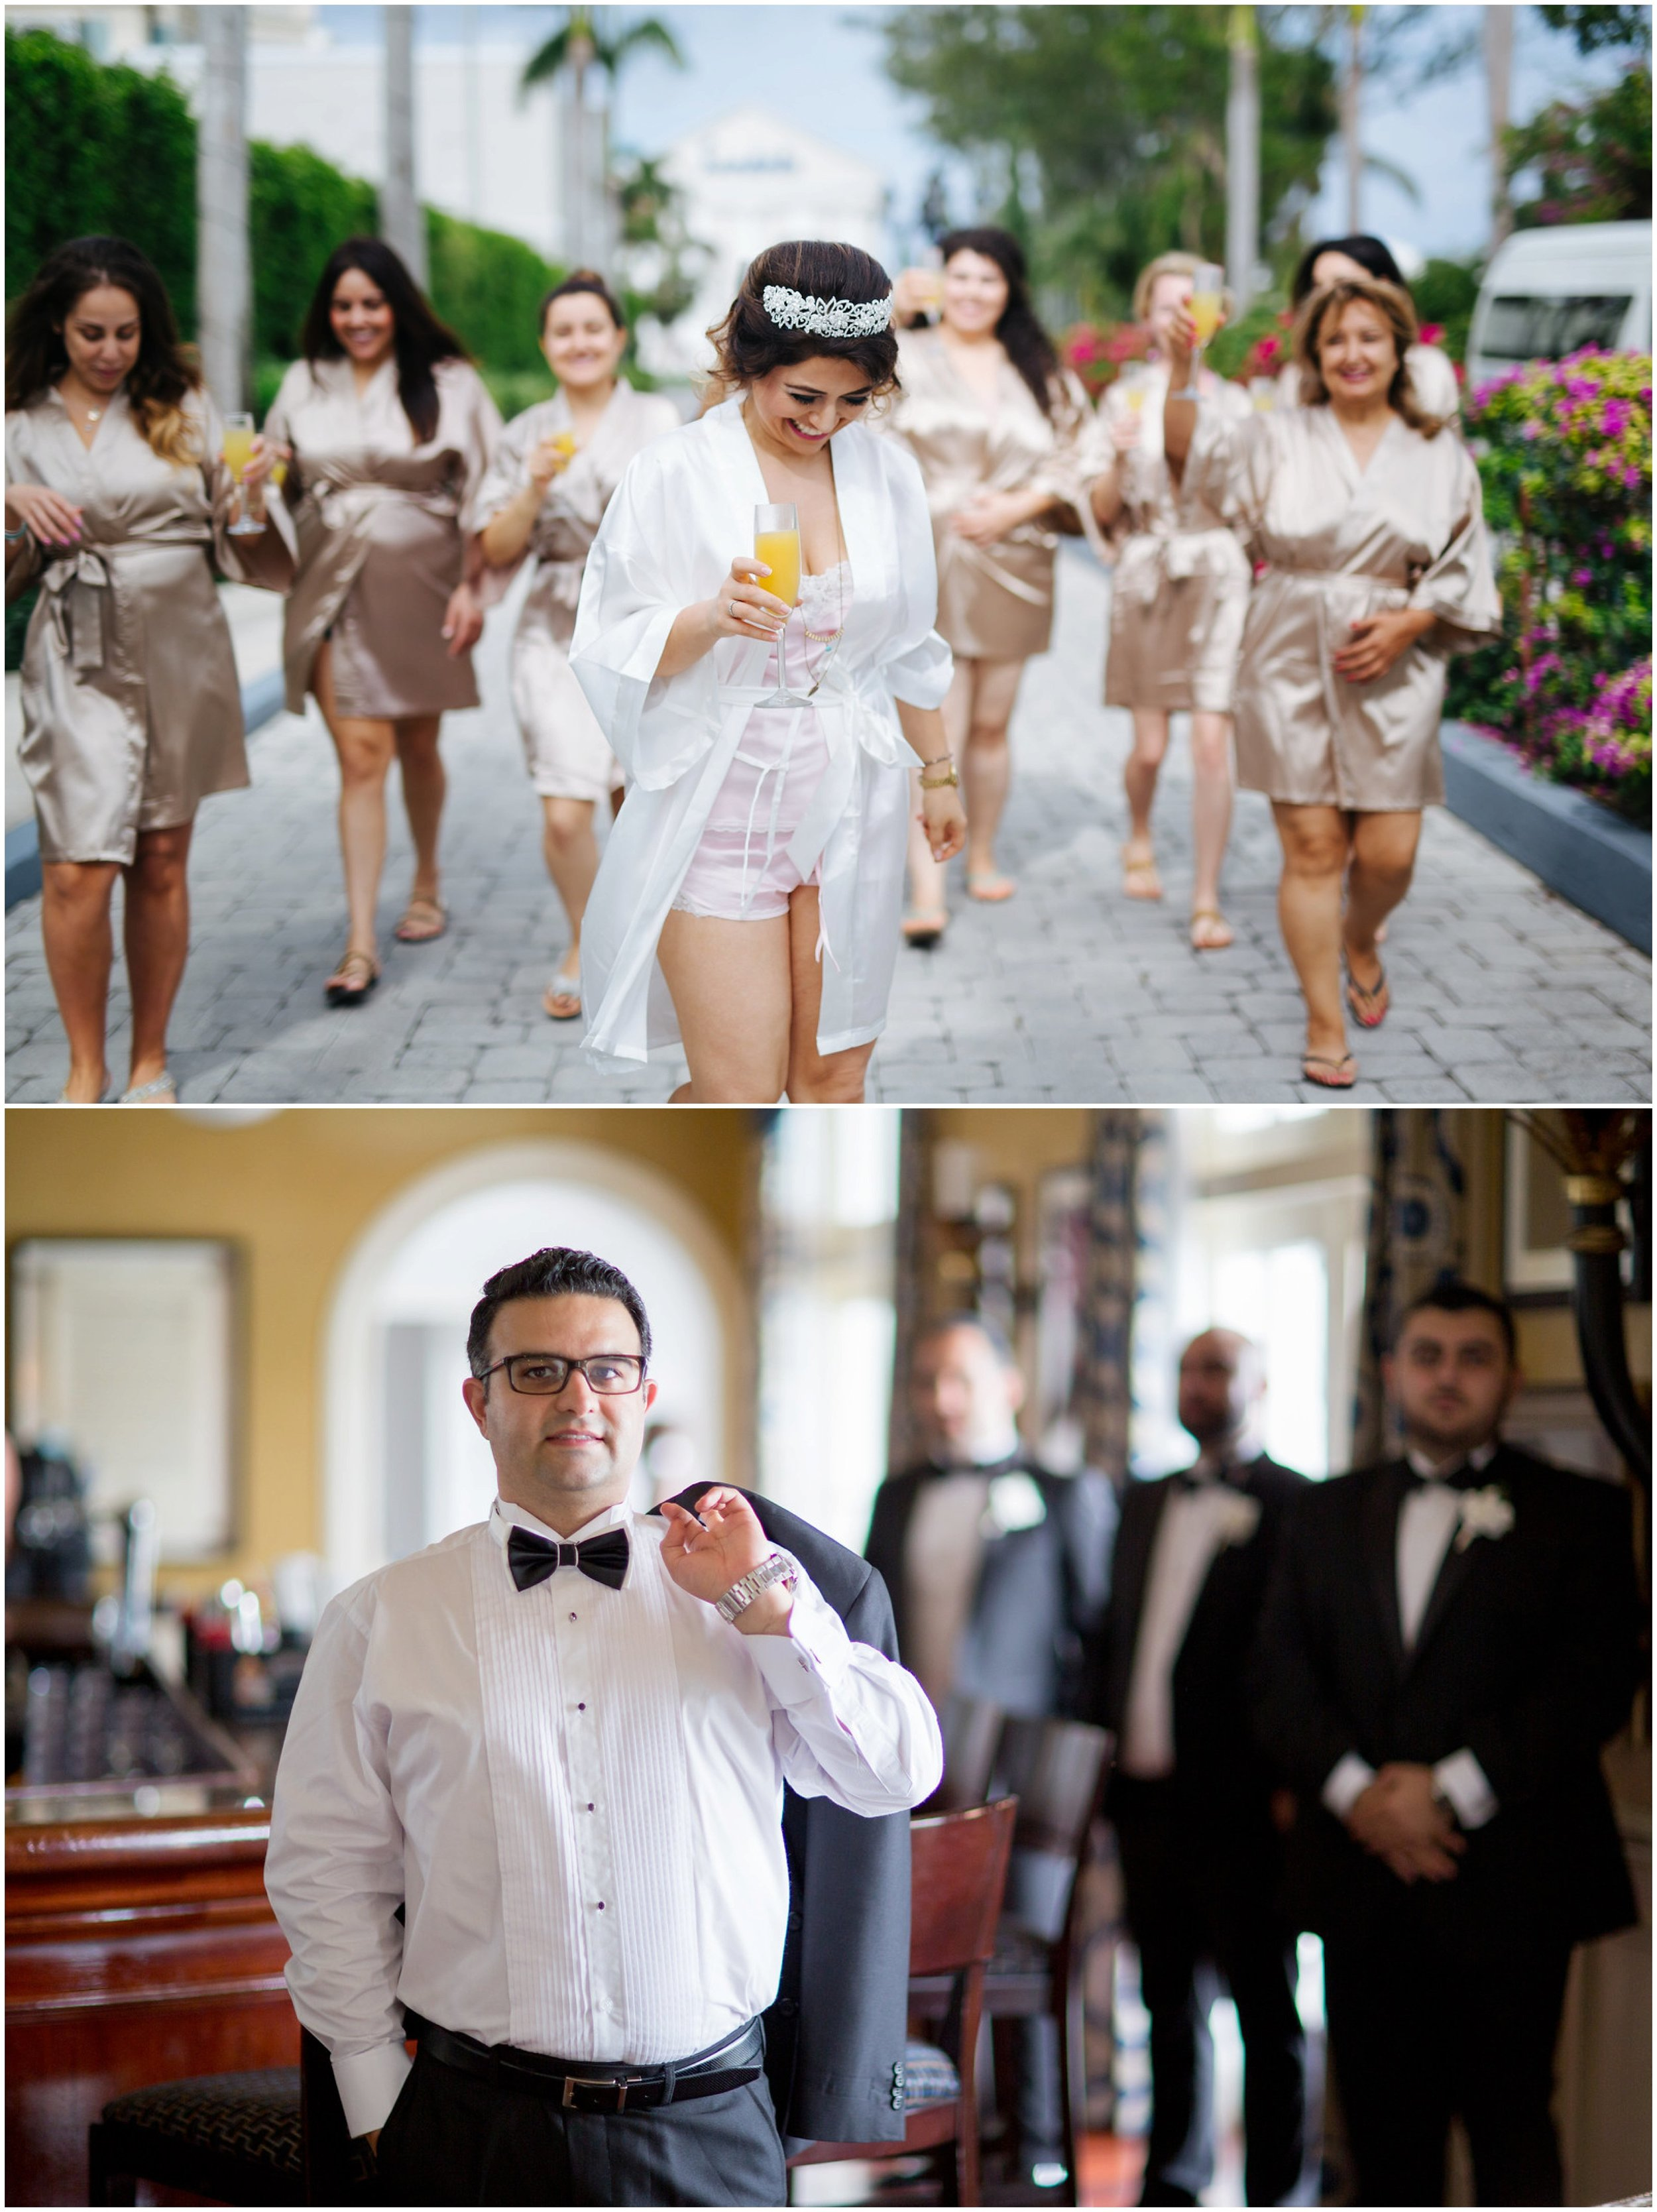 Le Cape Weddings- Destination Wedding Photography -ShayanandNikkie-149-X3_LuxuryDestinationPhotographer.jpg